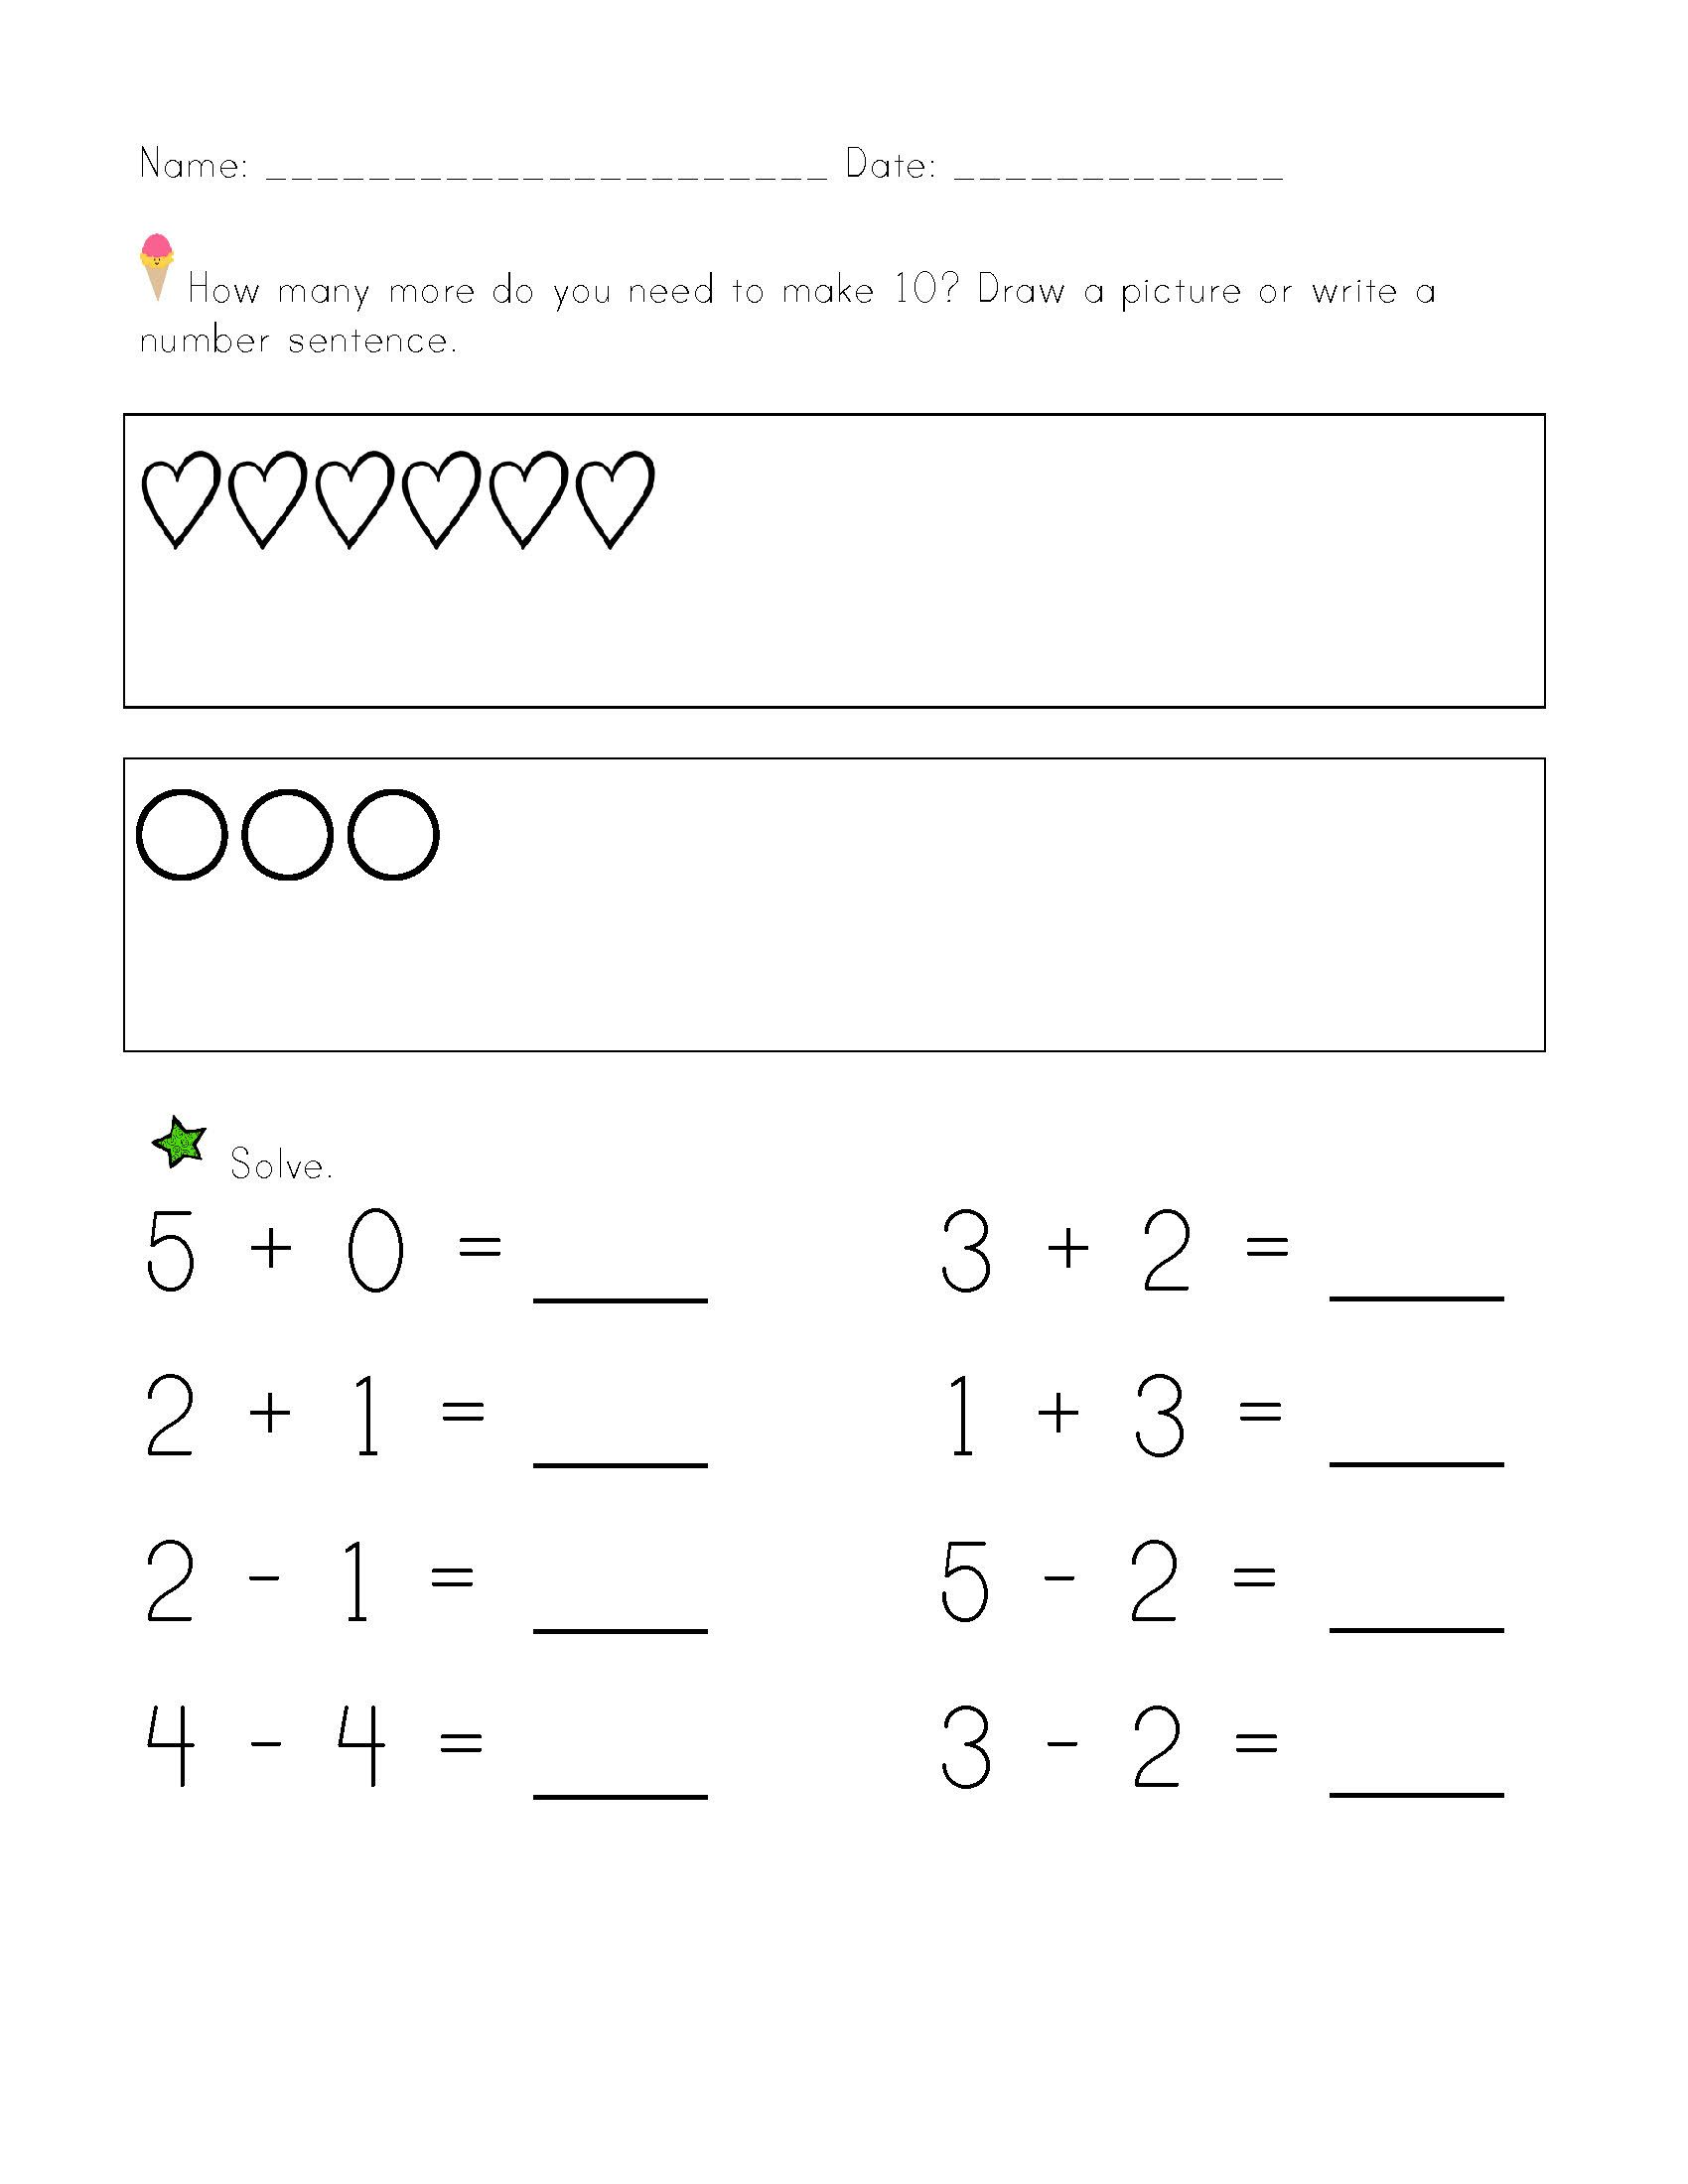 Algebraic Thinking Worksheets For Kindergarten   Printable Worksheets and  Activities for Teachers [ 2200 x 1700 Pixel ]